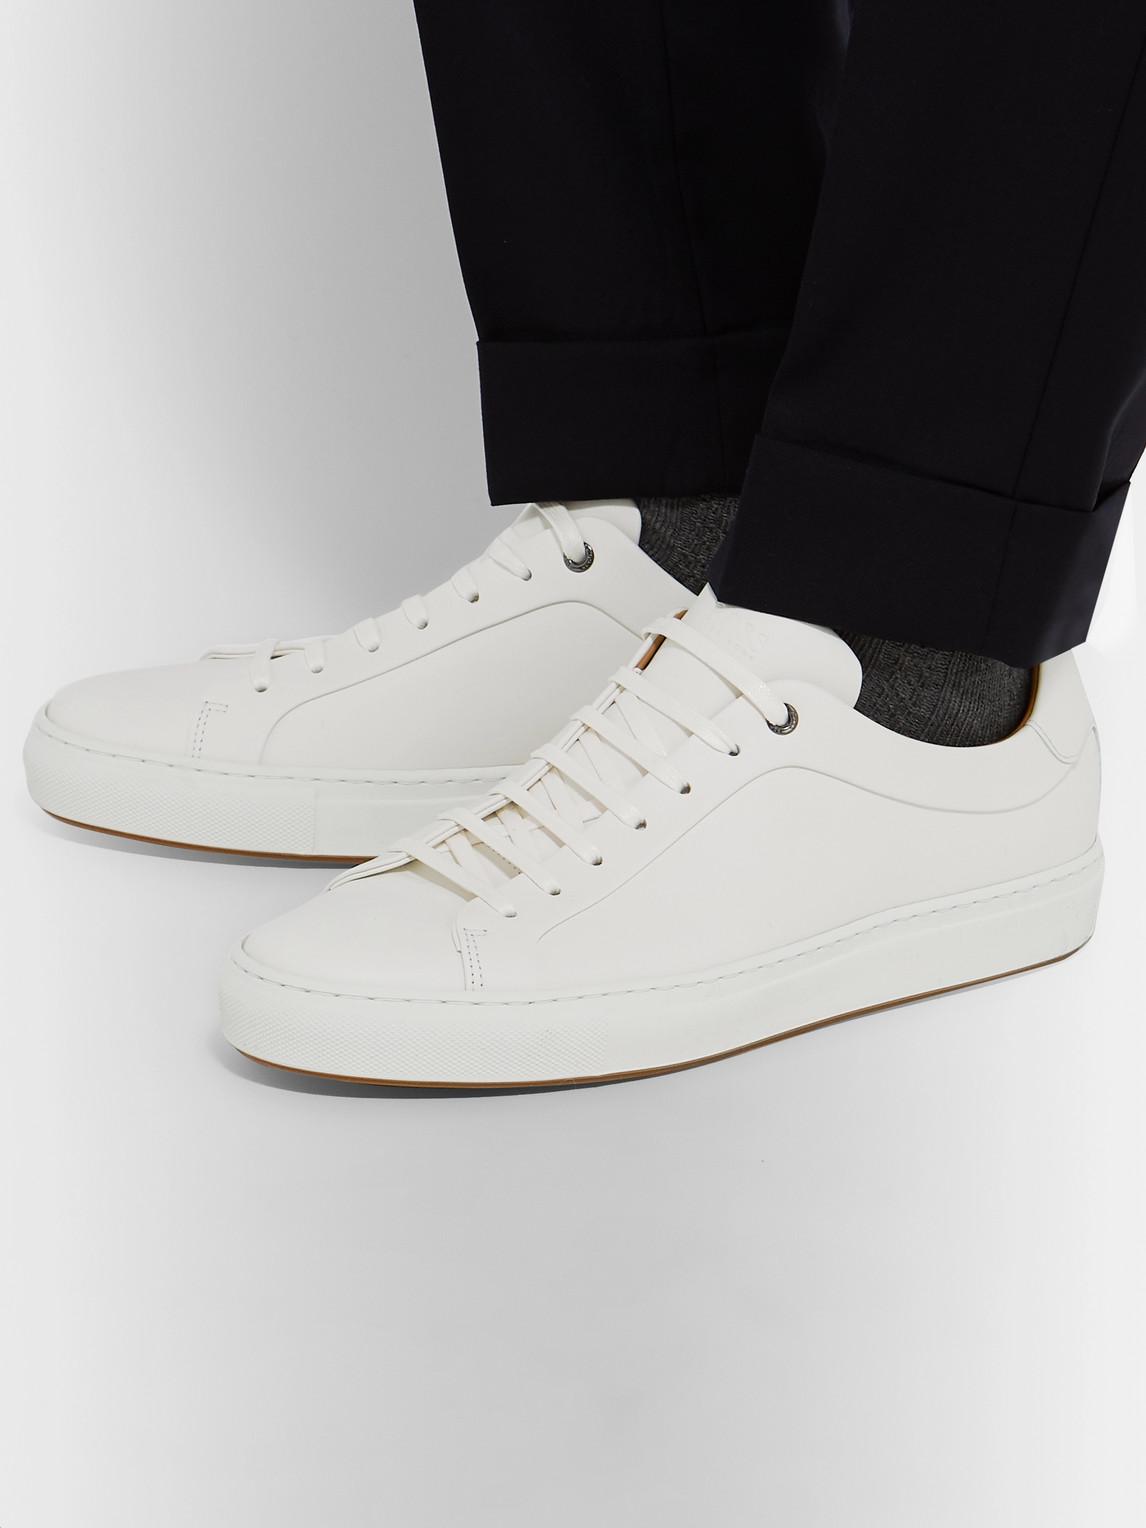 Hugo Boss Mirage Leather Sneakers In